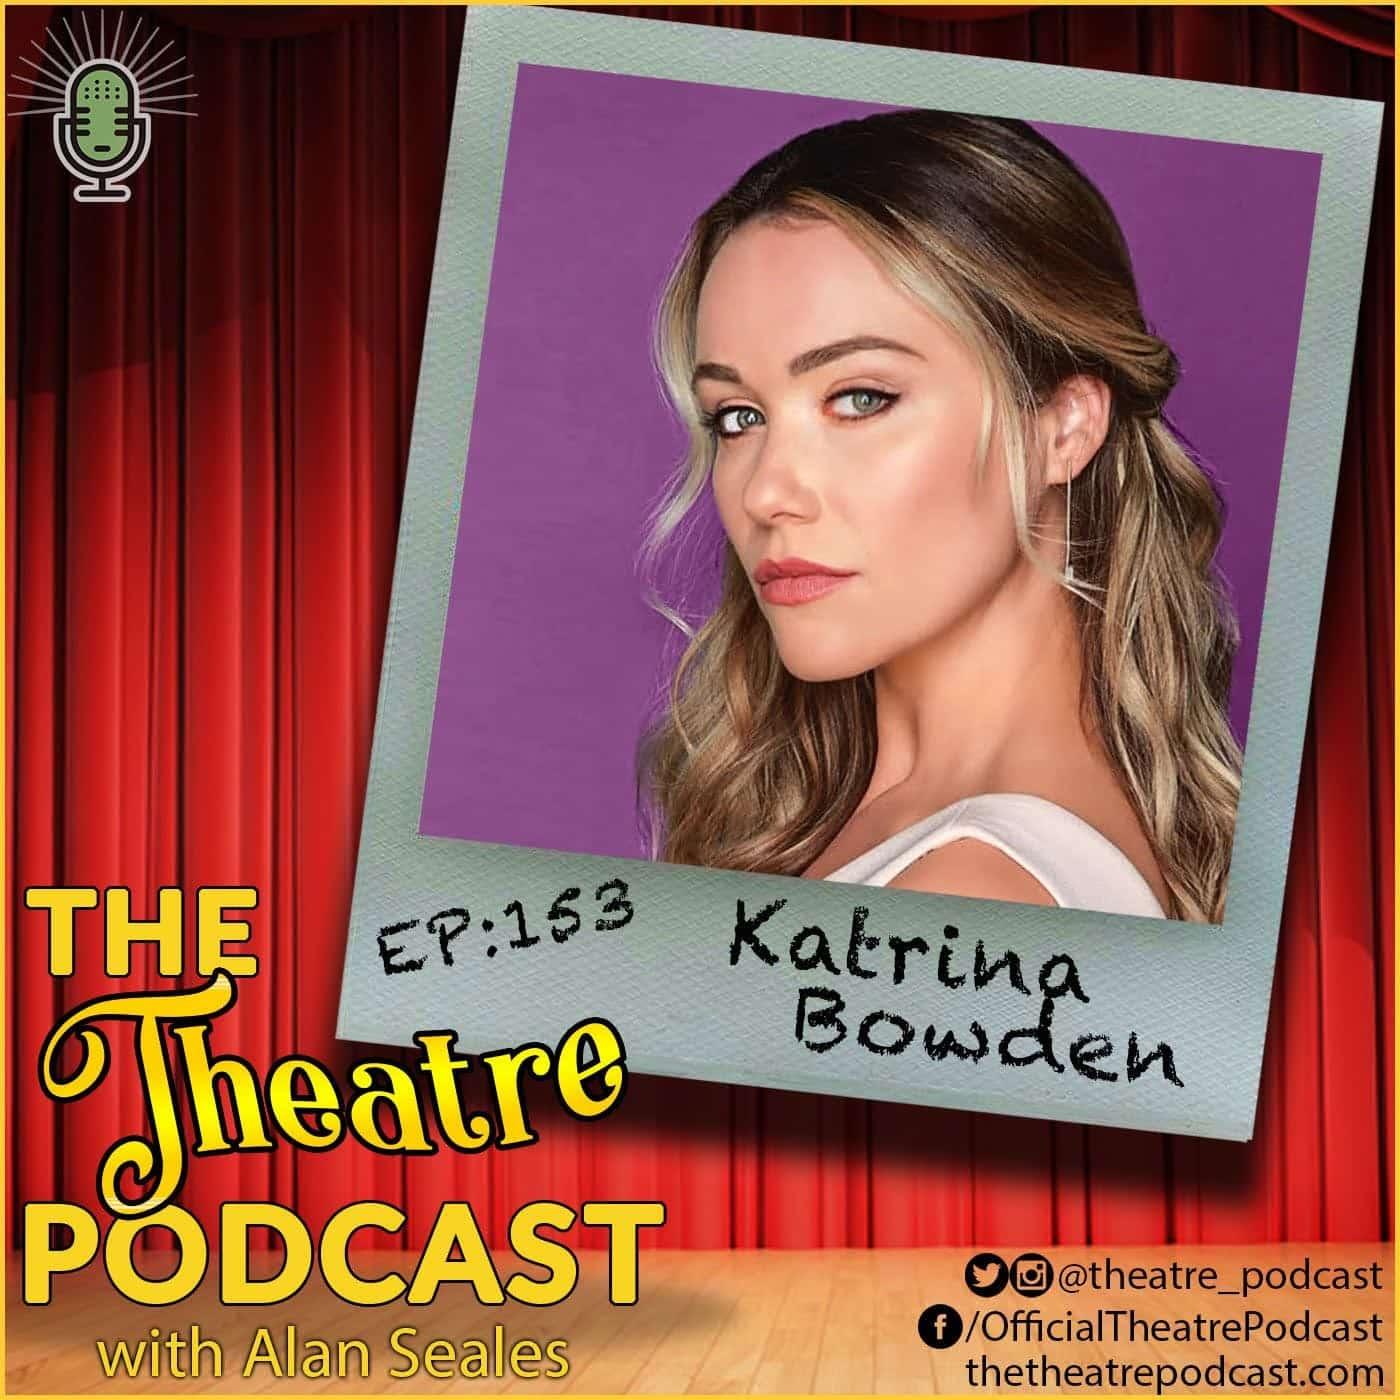 Ep153 - Katrina Bowden: 30 Rock, Tucker and Dale vs Evil, Great White